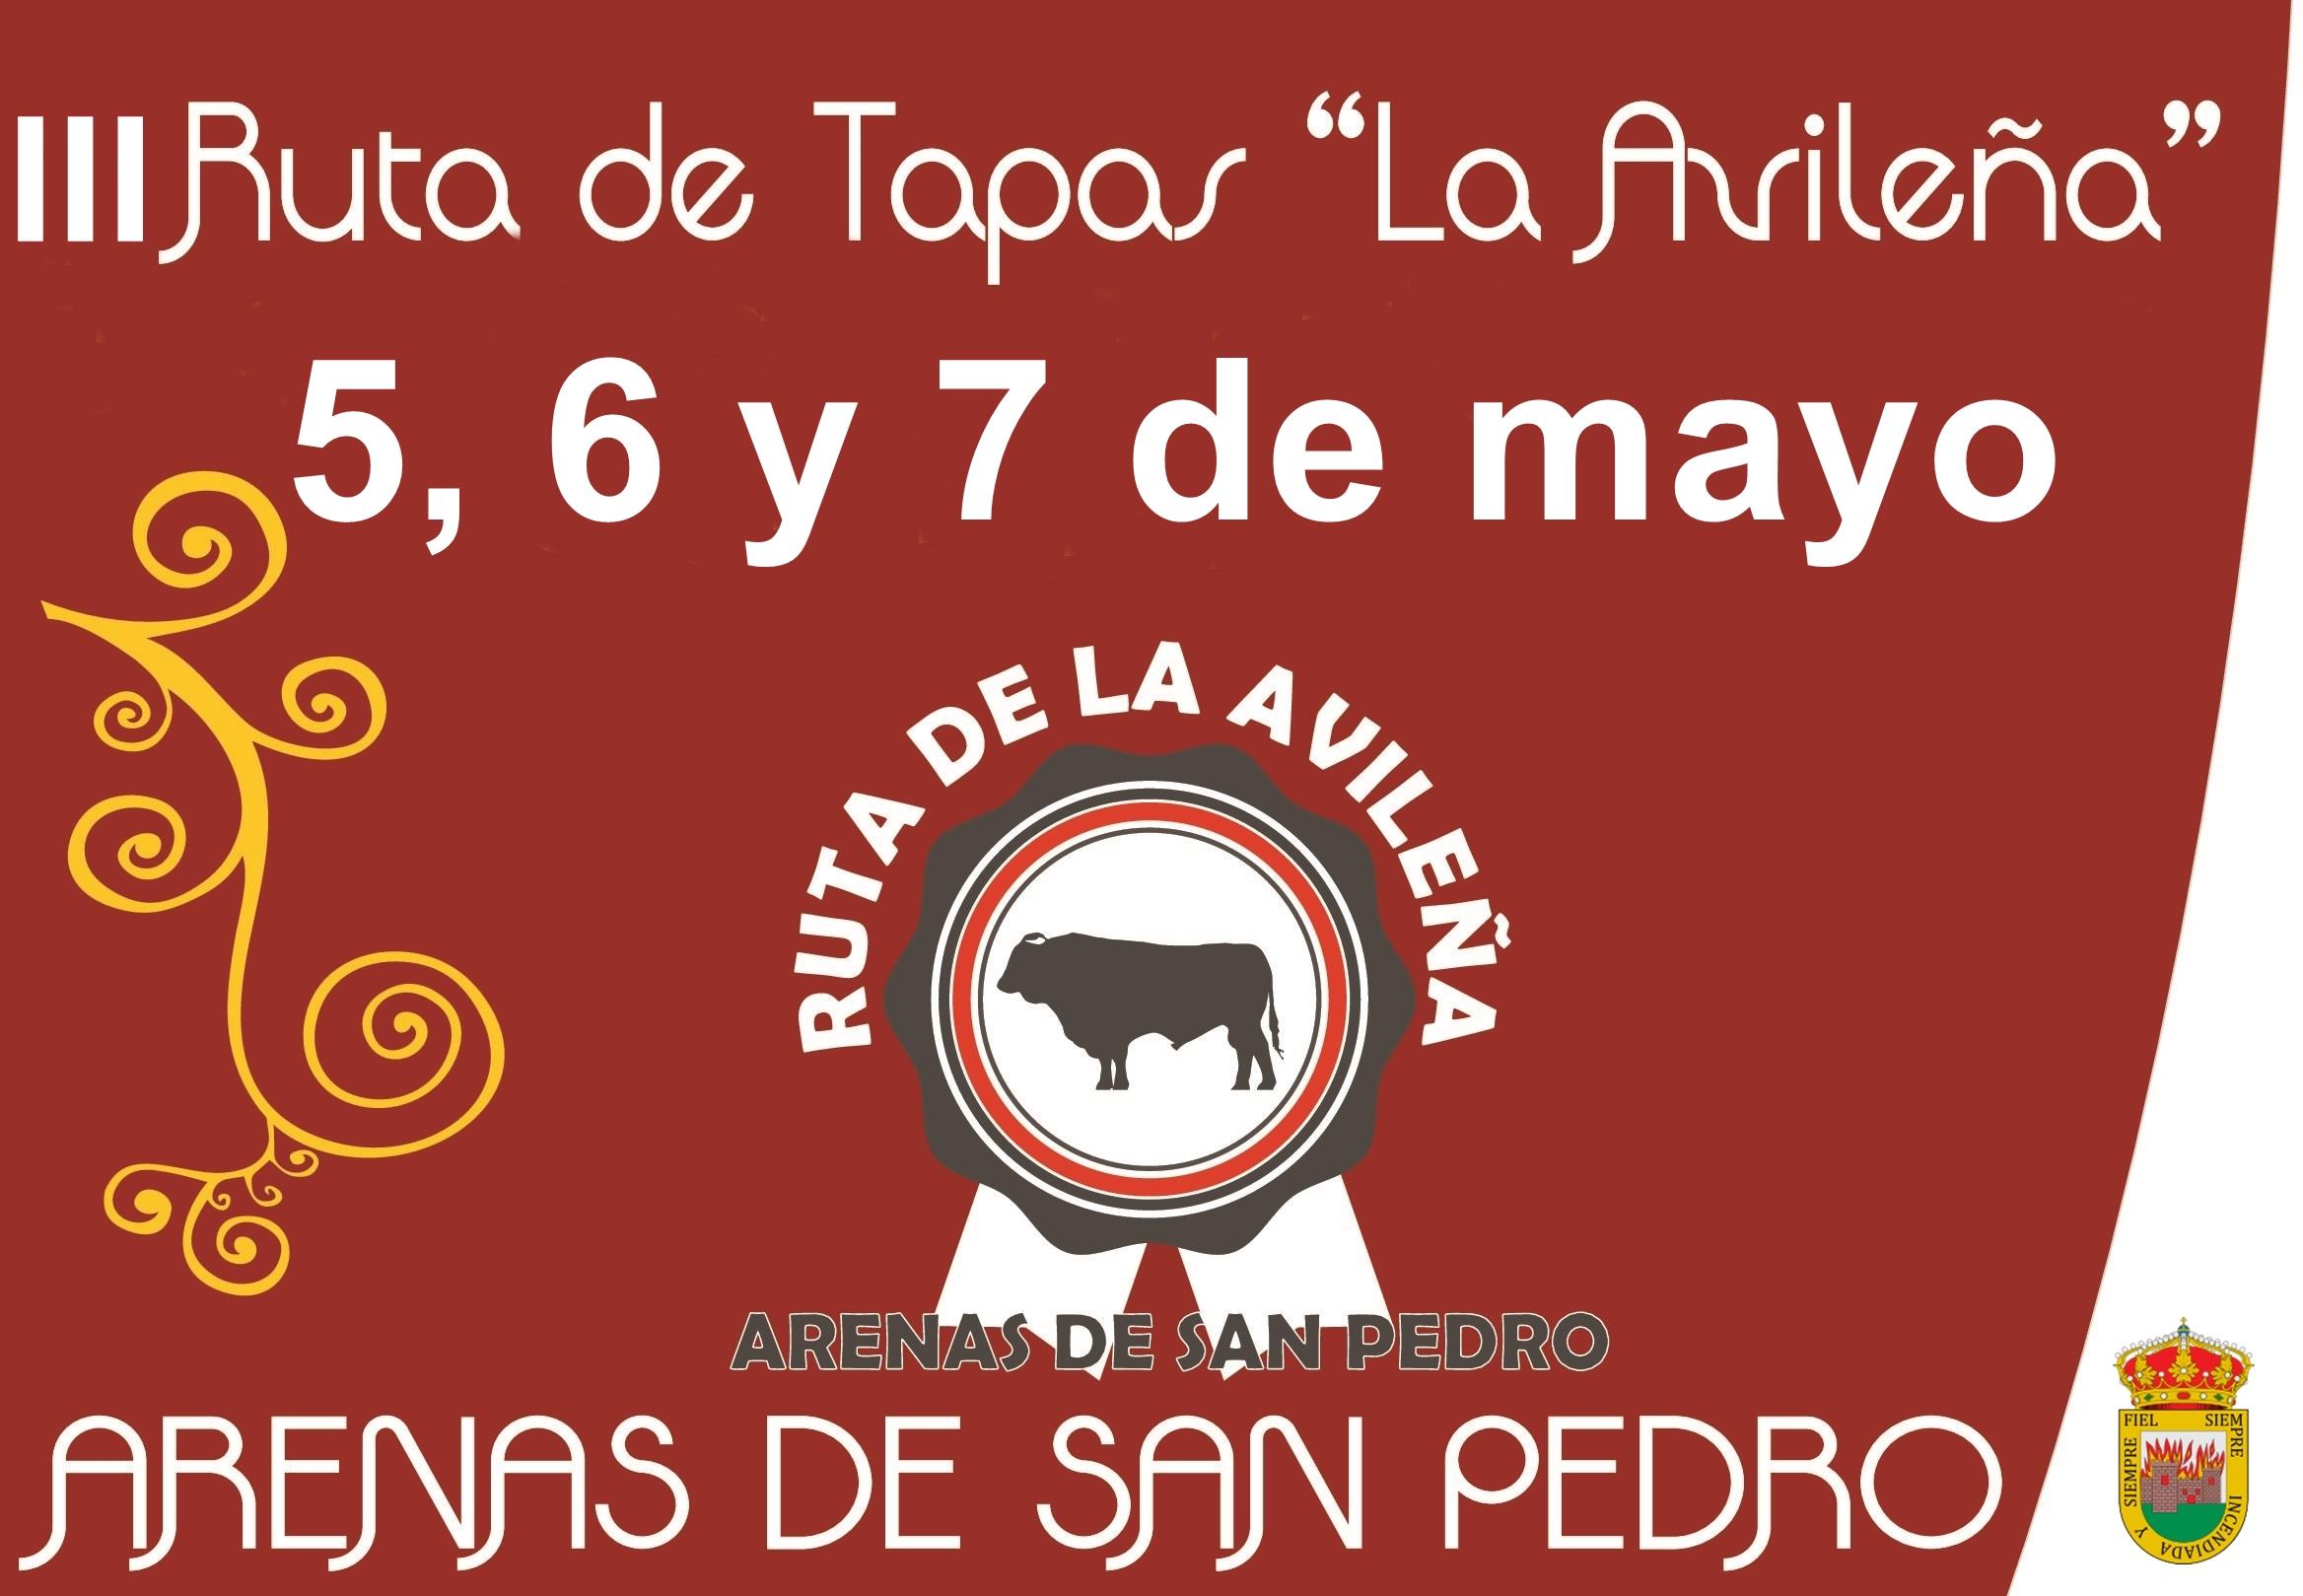 Tapas Avileña Arenas de San Pedro